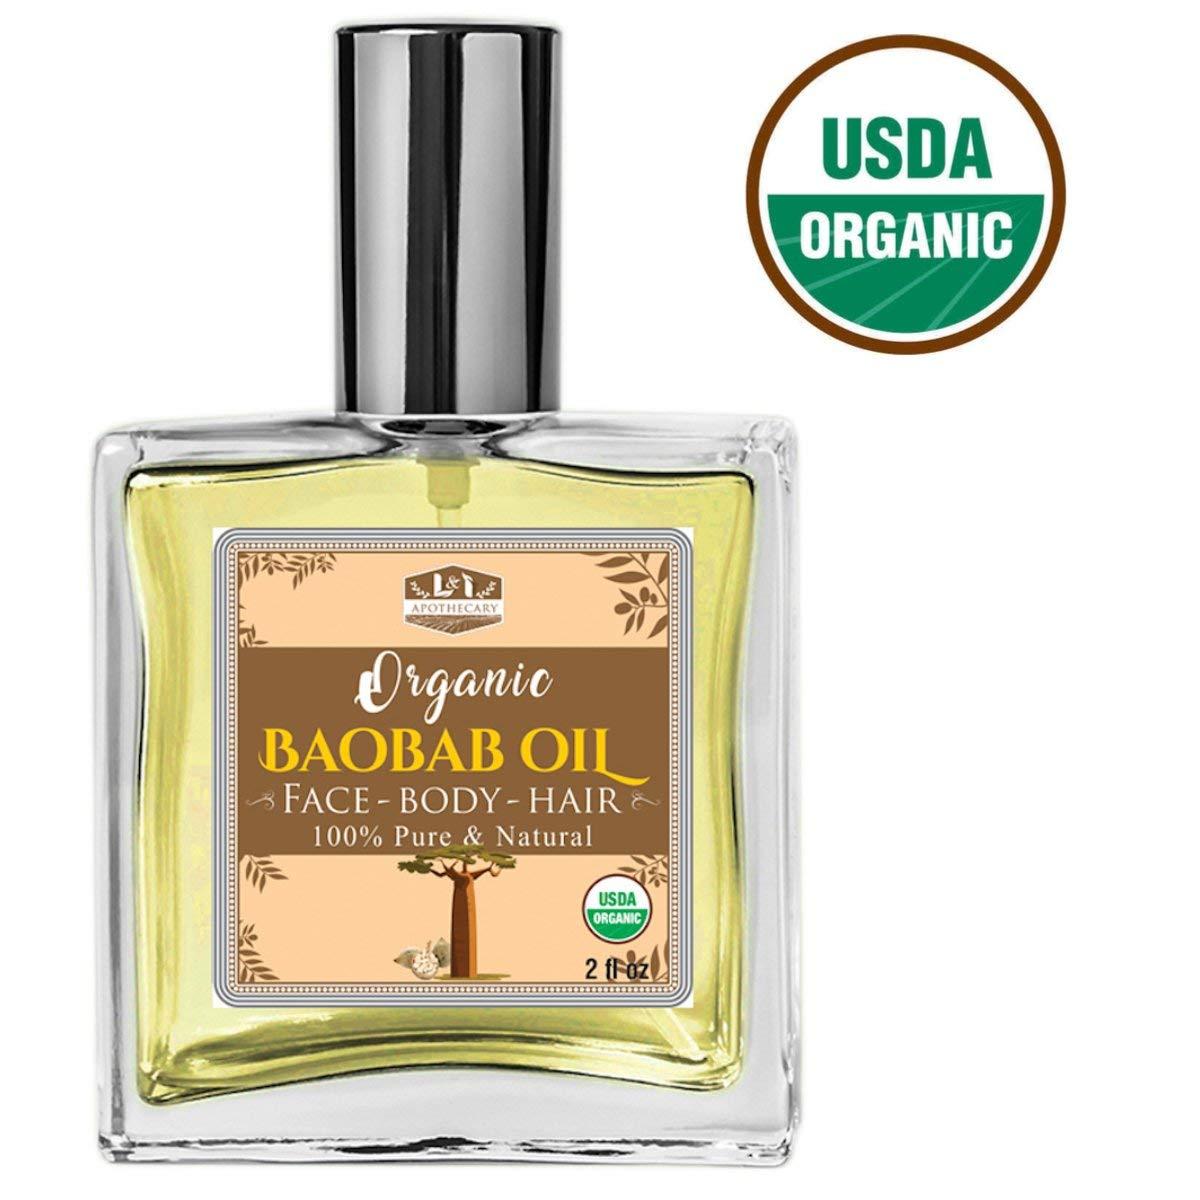 Organic Baobab Luxury Facial & Hair Oil - Excellent Anti-Aging Serum & Moisturizing Properties. Loaded with Natural Essential Antioxidants & Skin Loving Vital Nutrients